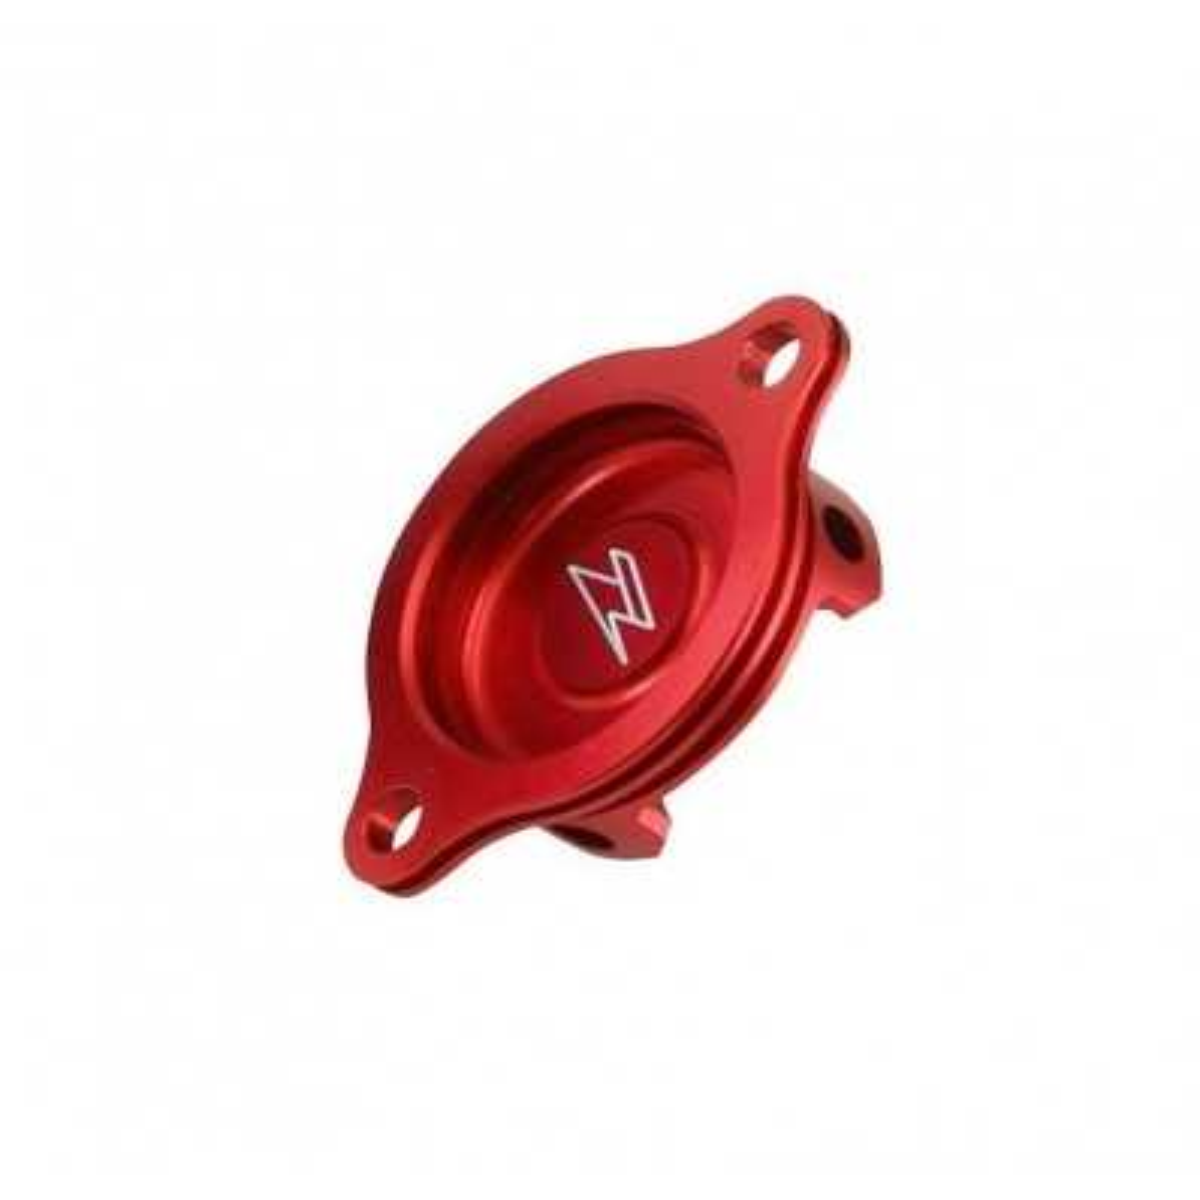 ZE90.1173 - Tapa Filtro Aceite Zeta Kx450F´06-, Klx450R´08- Rojo